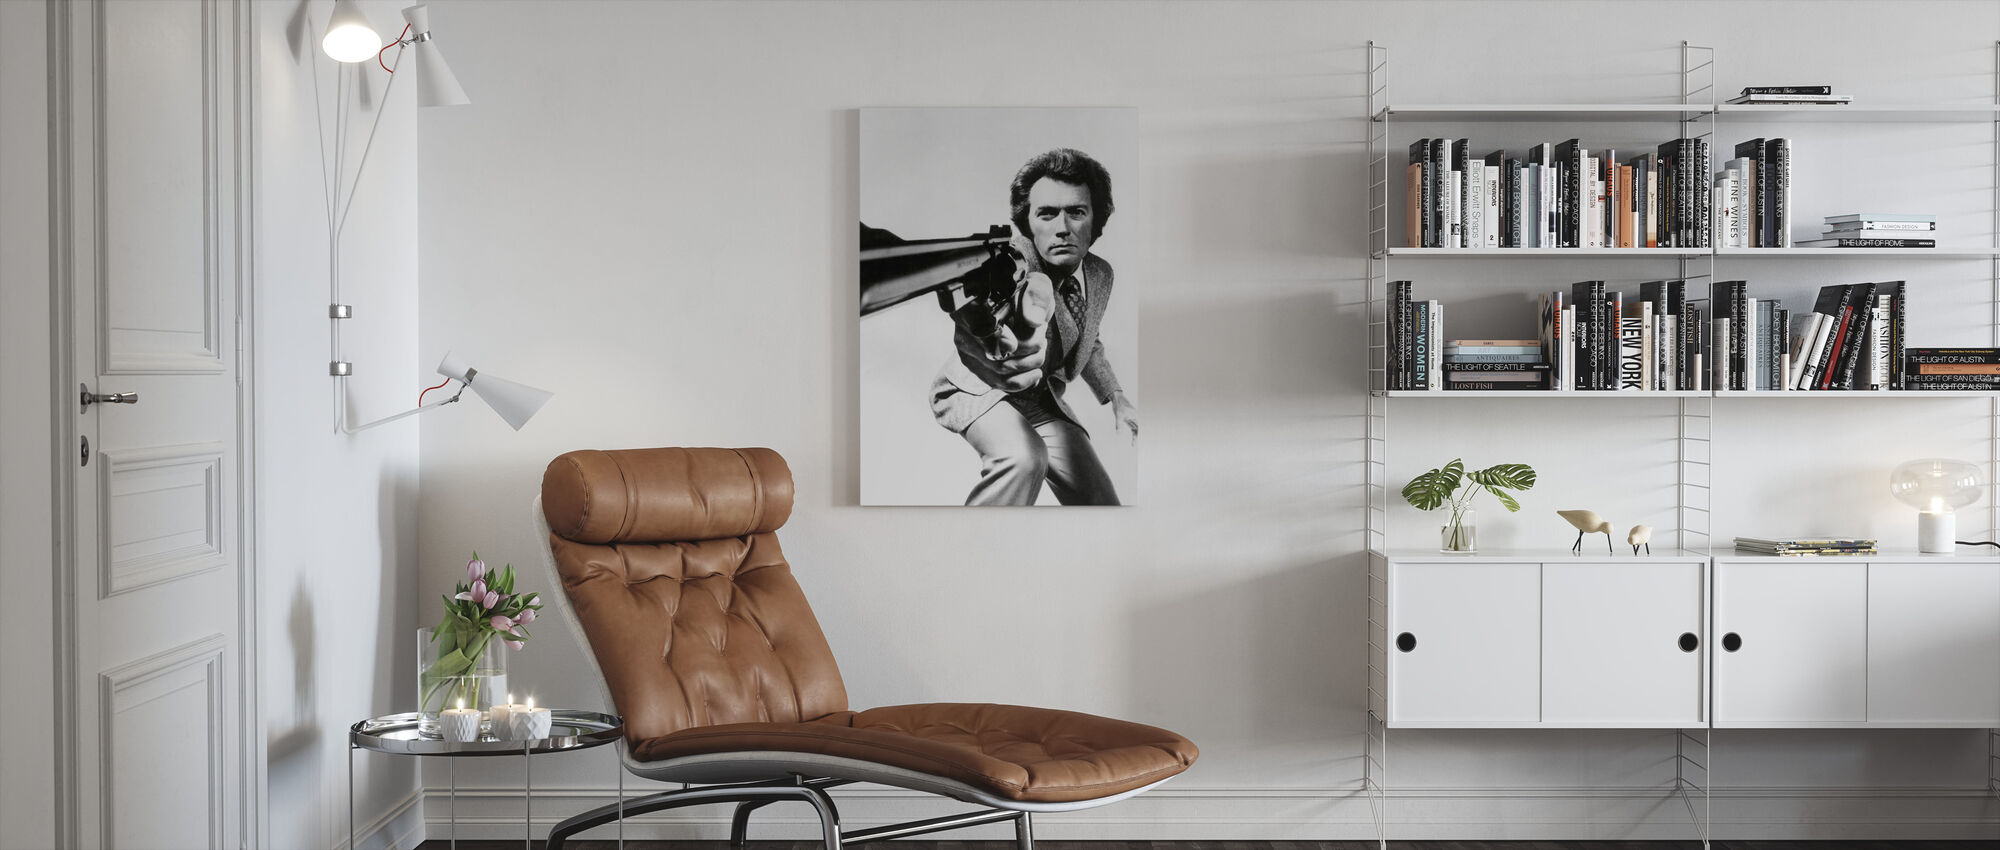 Clint Eastwood i Magnum Force - Canvastavla - Vardagsrum